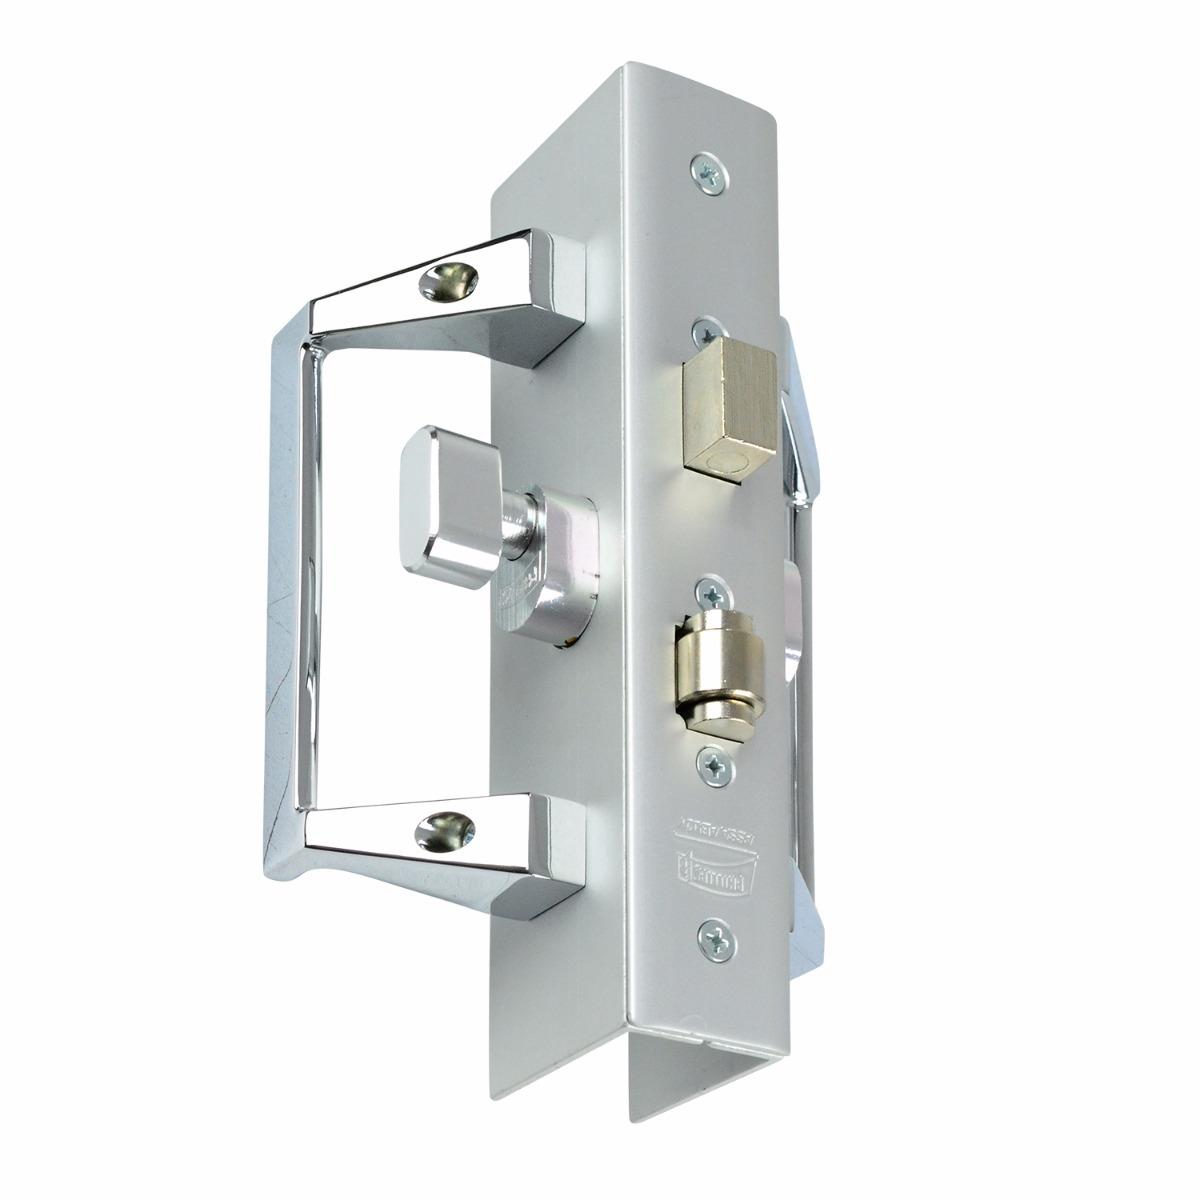 Cerradura phillips 525 mc para puertas de aluminio for Cerraduras para puertas de aluminio